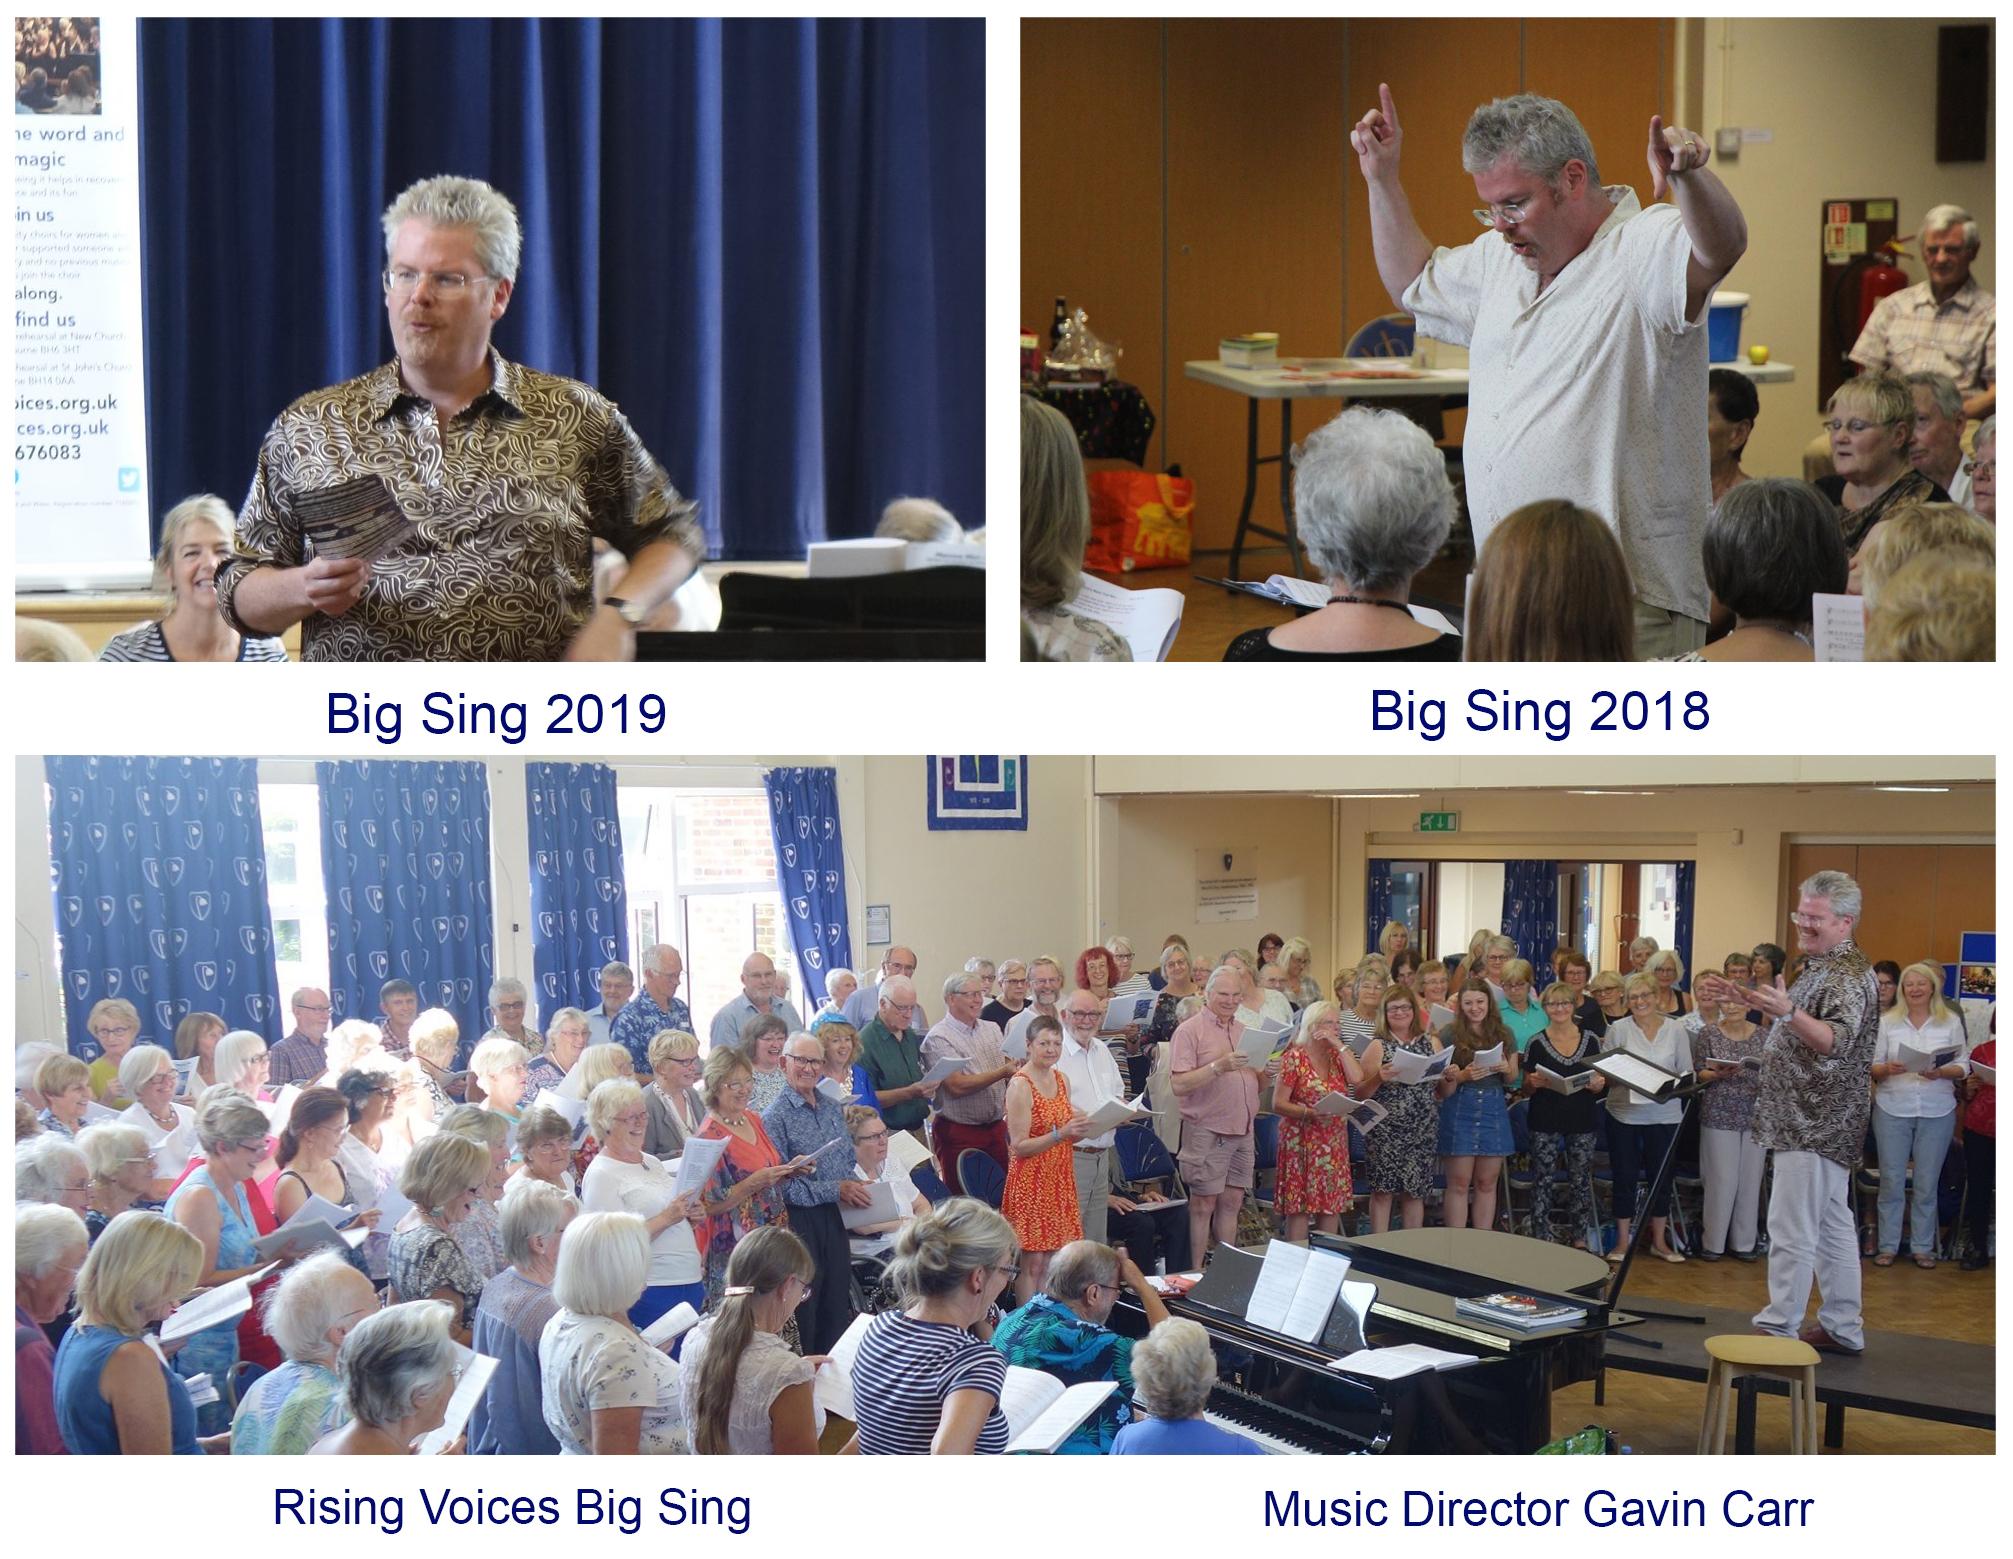 14th July Rising Voices Choir Gavin Carr Big SIng 2019 Concert